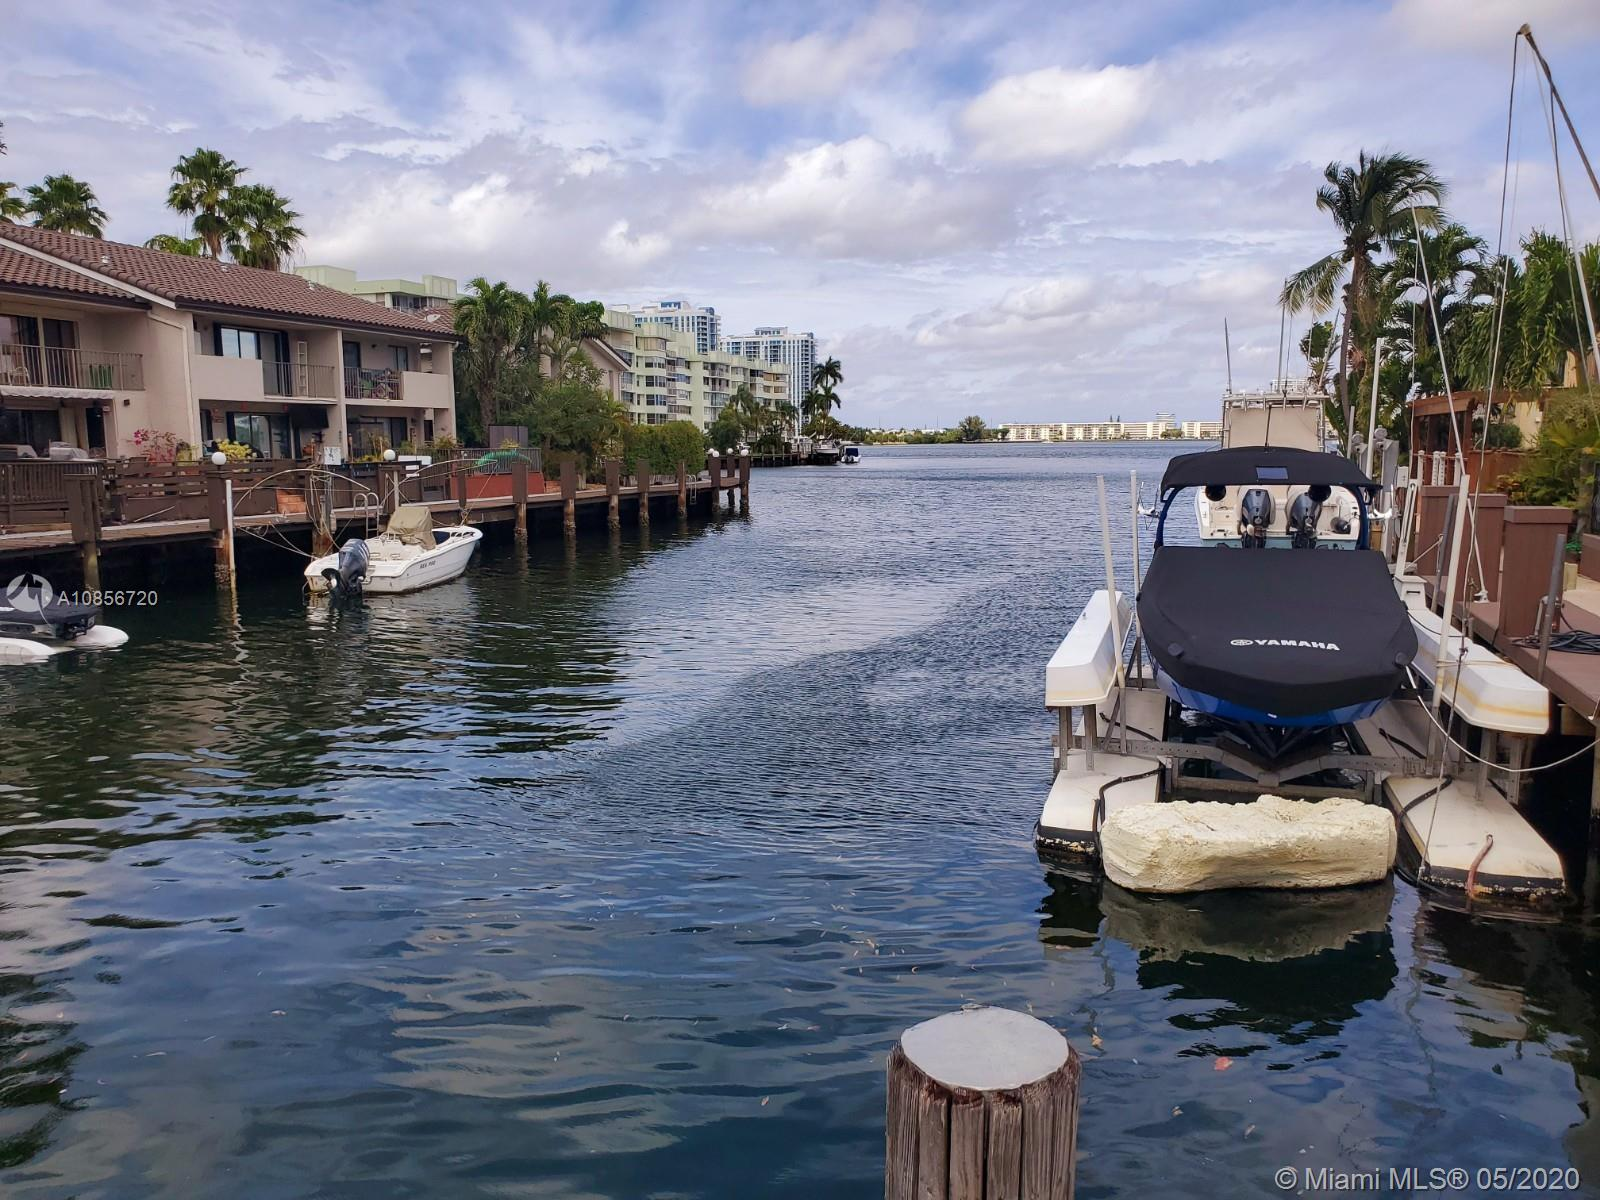 16470 NE 27th Pl # 35, North Miami Beach, Florida 33160, 3 Bedrooms Bedrooms, ,3 BathroomsBathrooms,Residential,For Sale,16470 NE 27th Pl # 35,A10856720